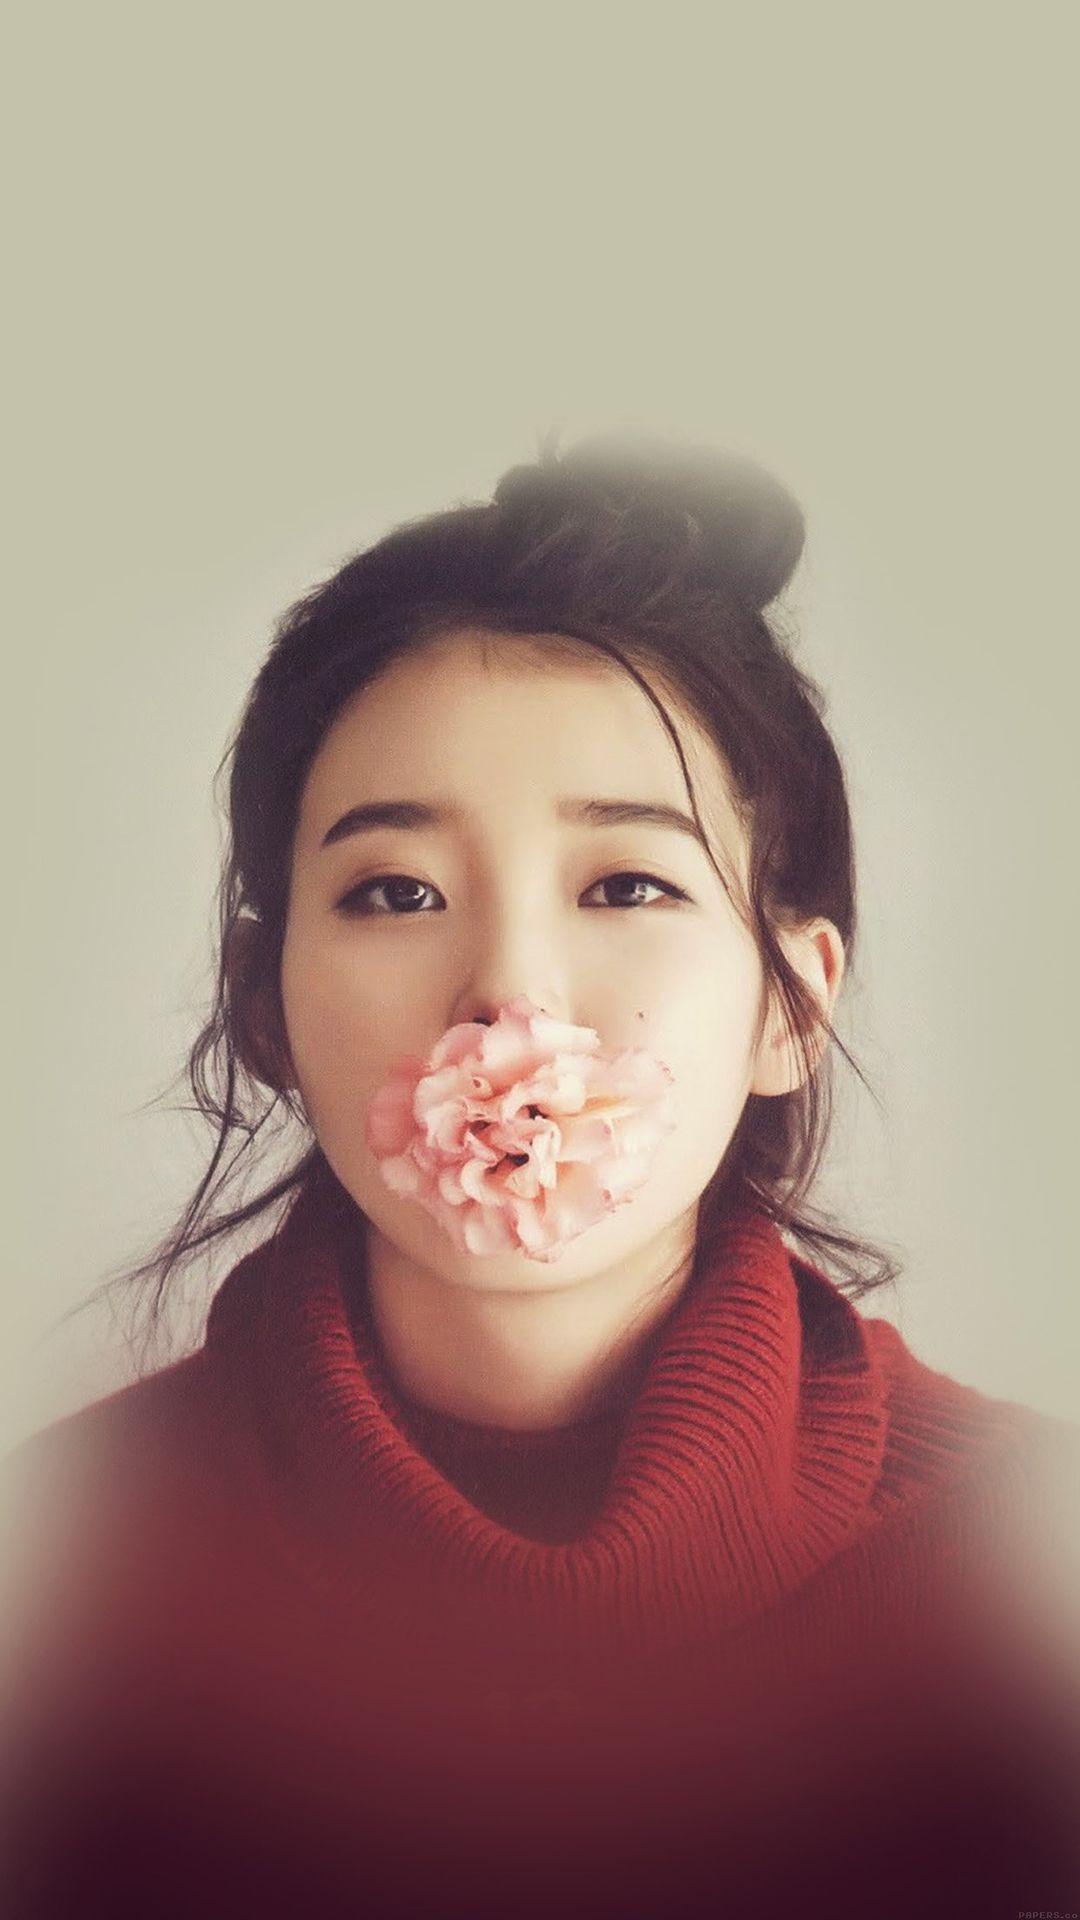 kpop iu singer music cute girl sexy iphone 6 wallpaper